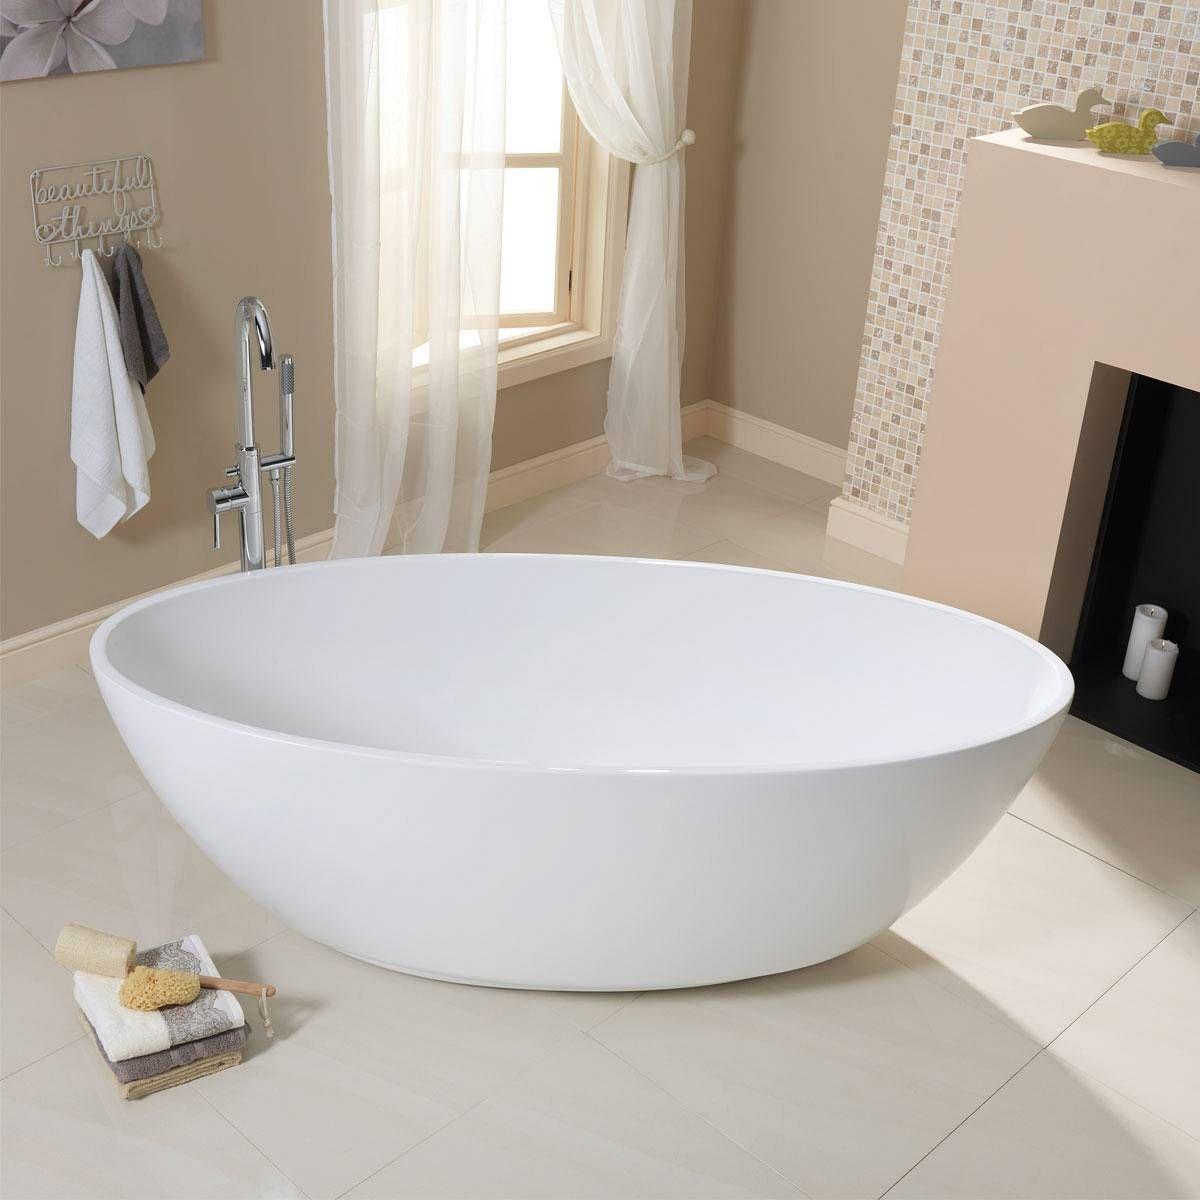 Harrison Roll Top Bath - looks like an egg! £399 from Victoria plumb ...